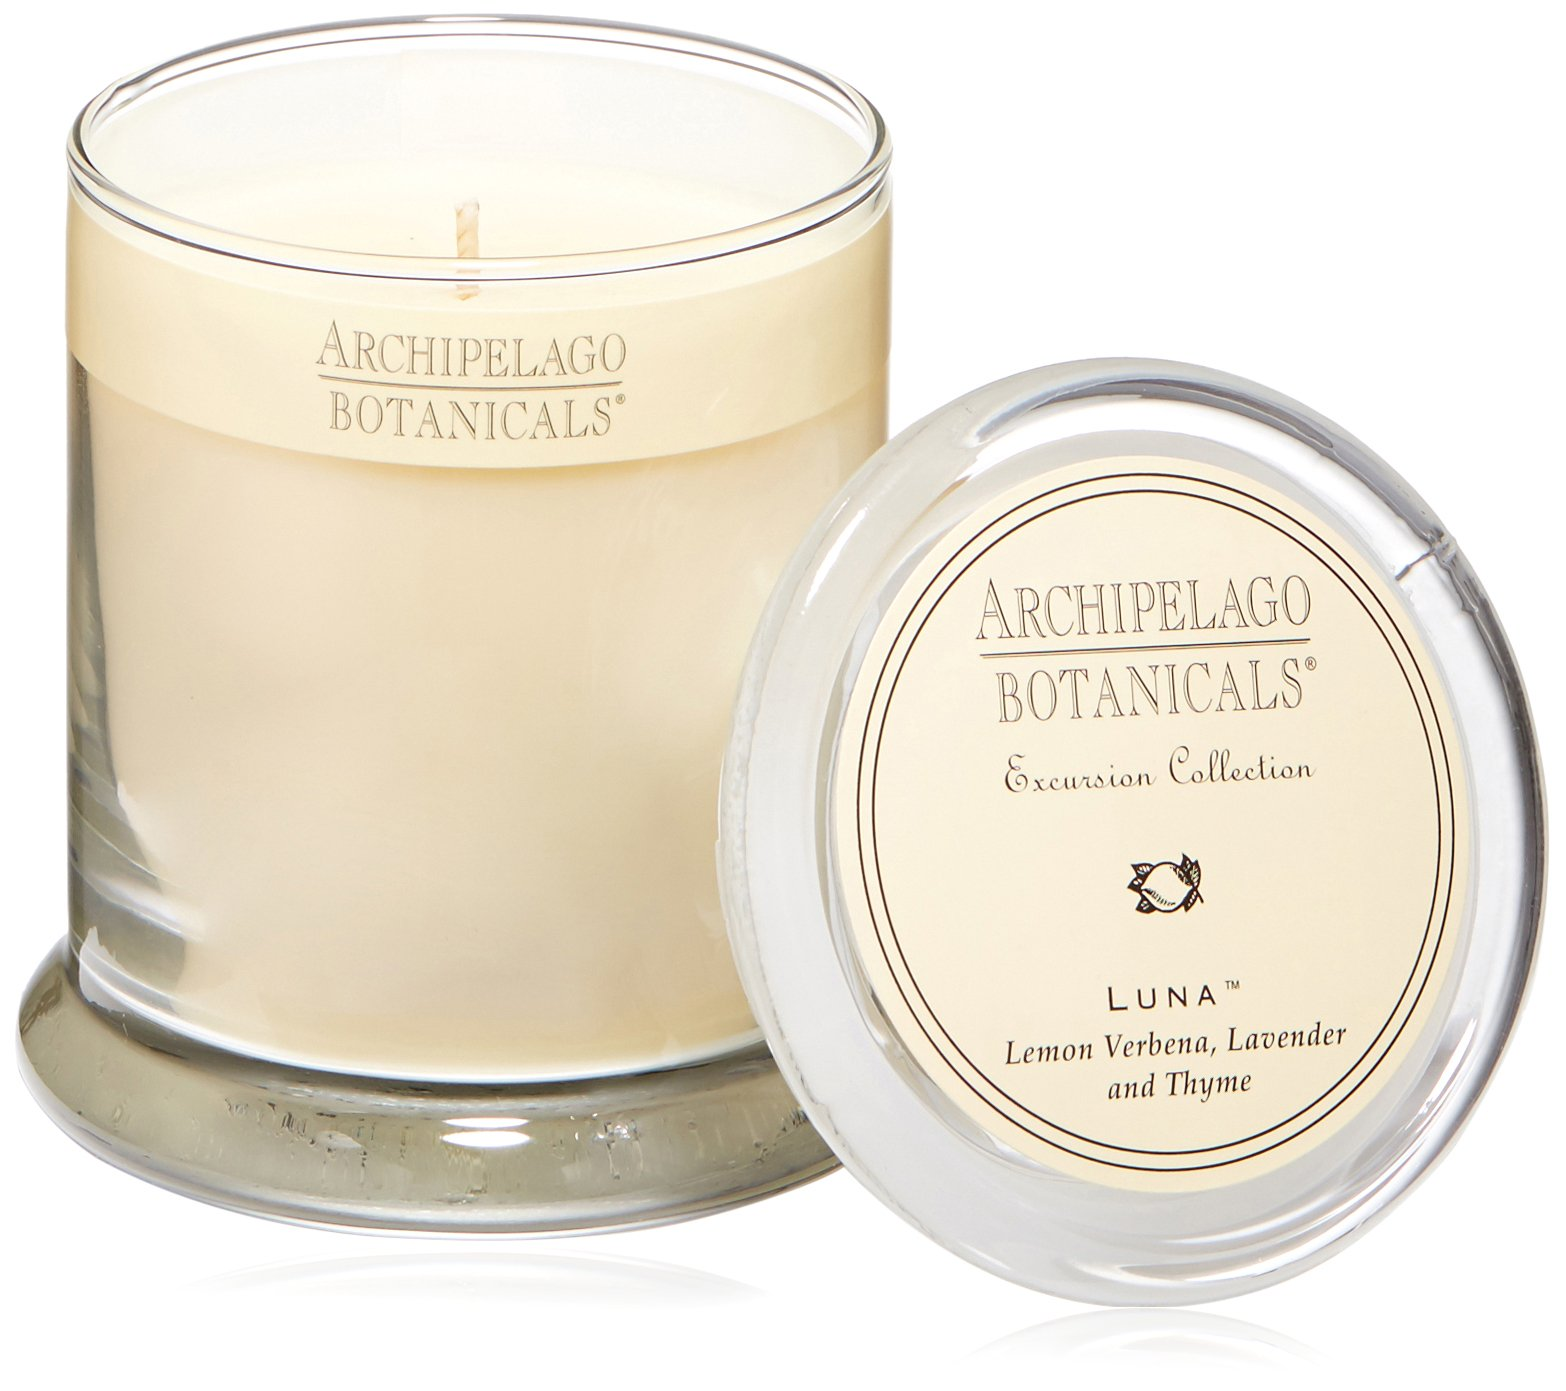 Archipelago Glass Jar Candle, Luna, 8.62 oz.